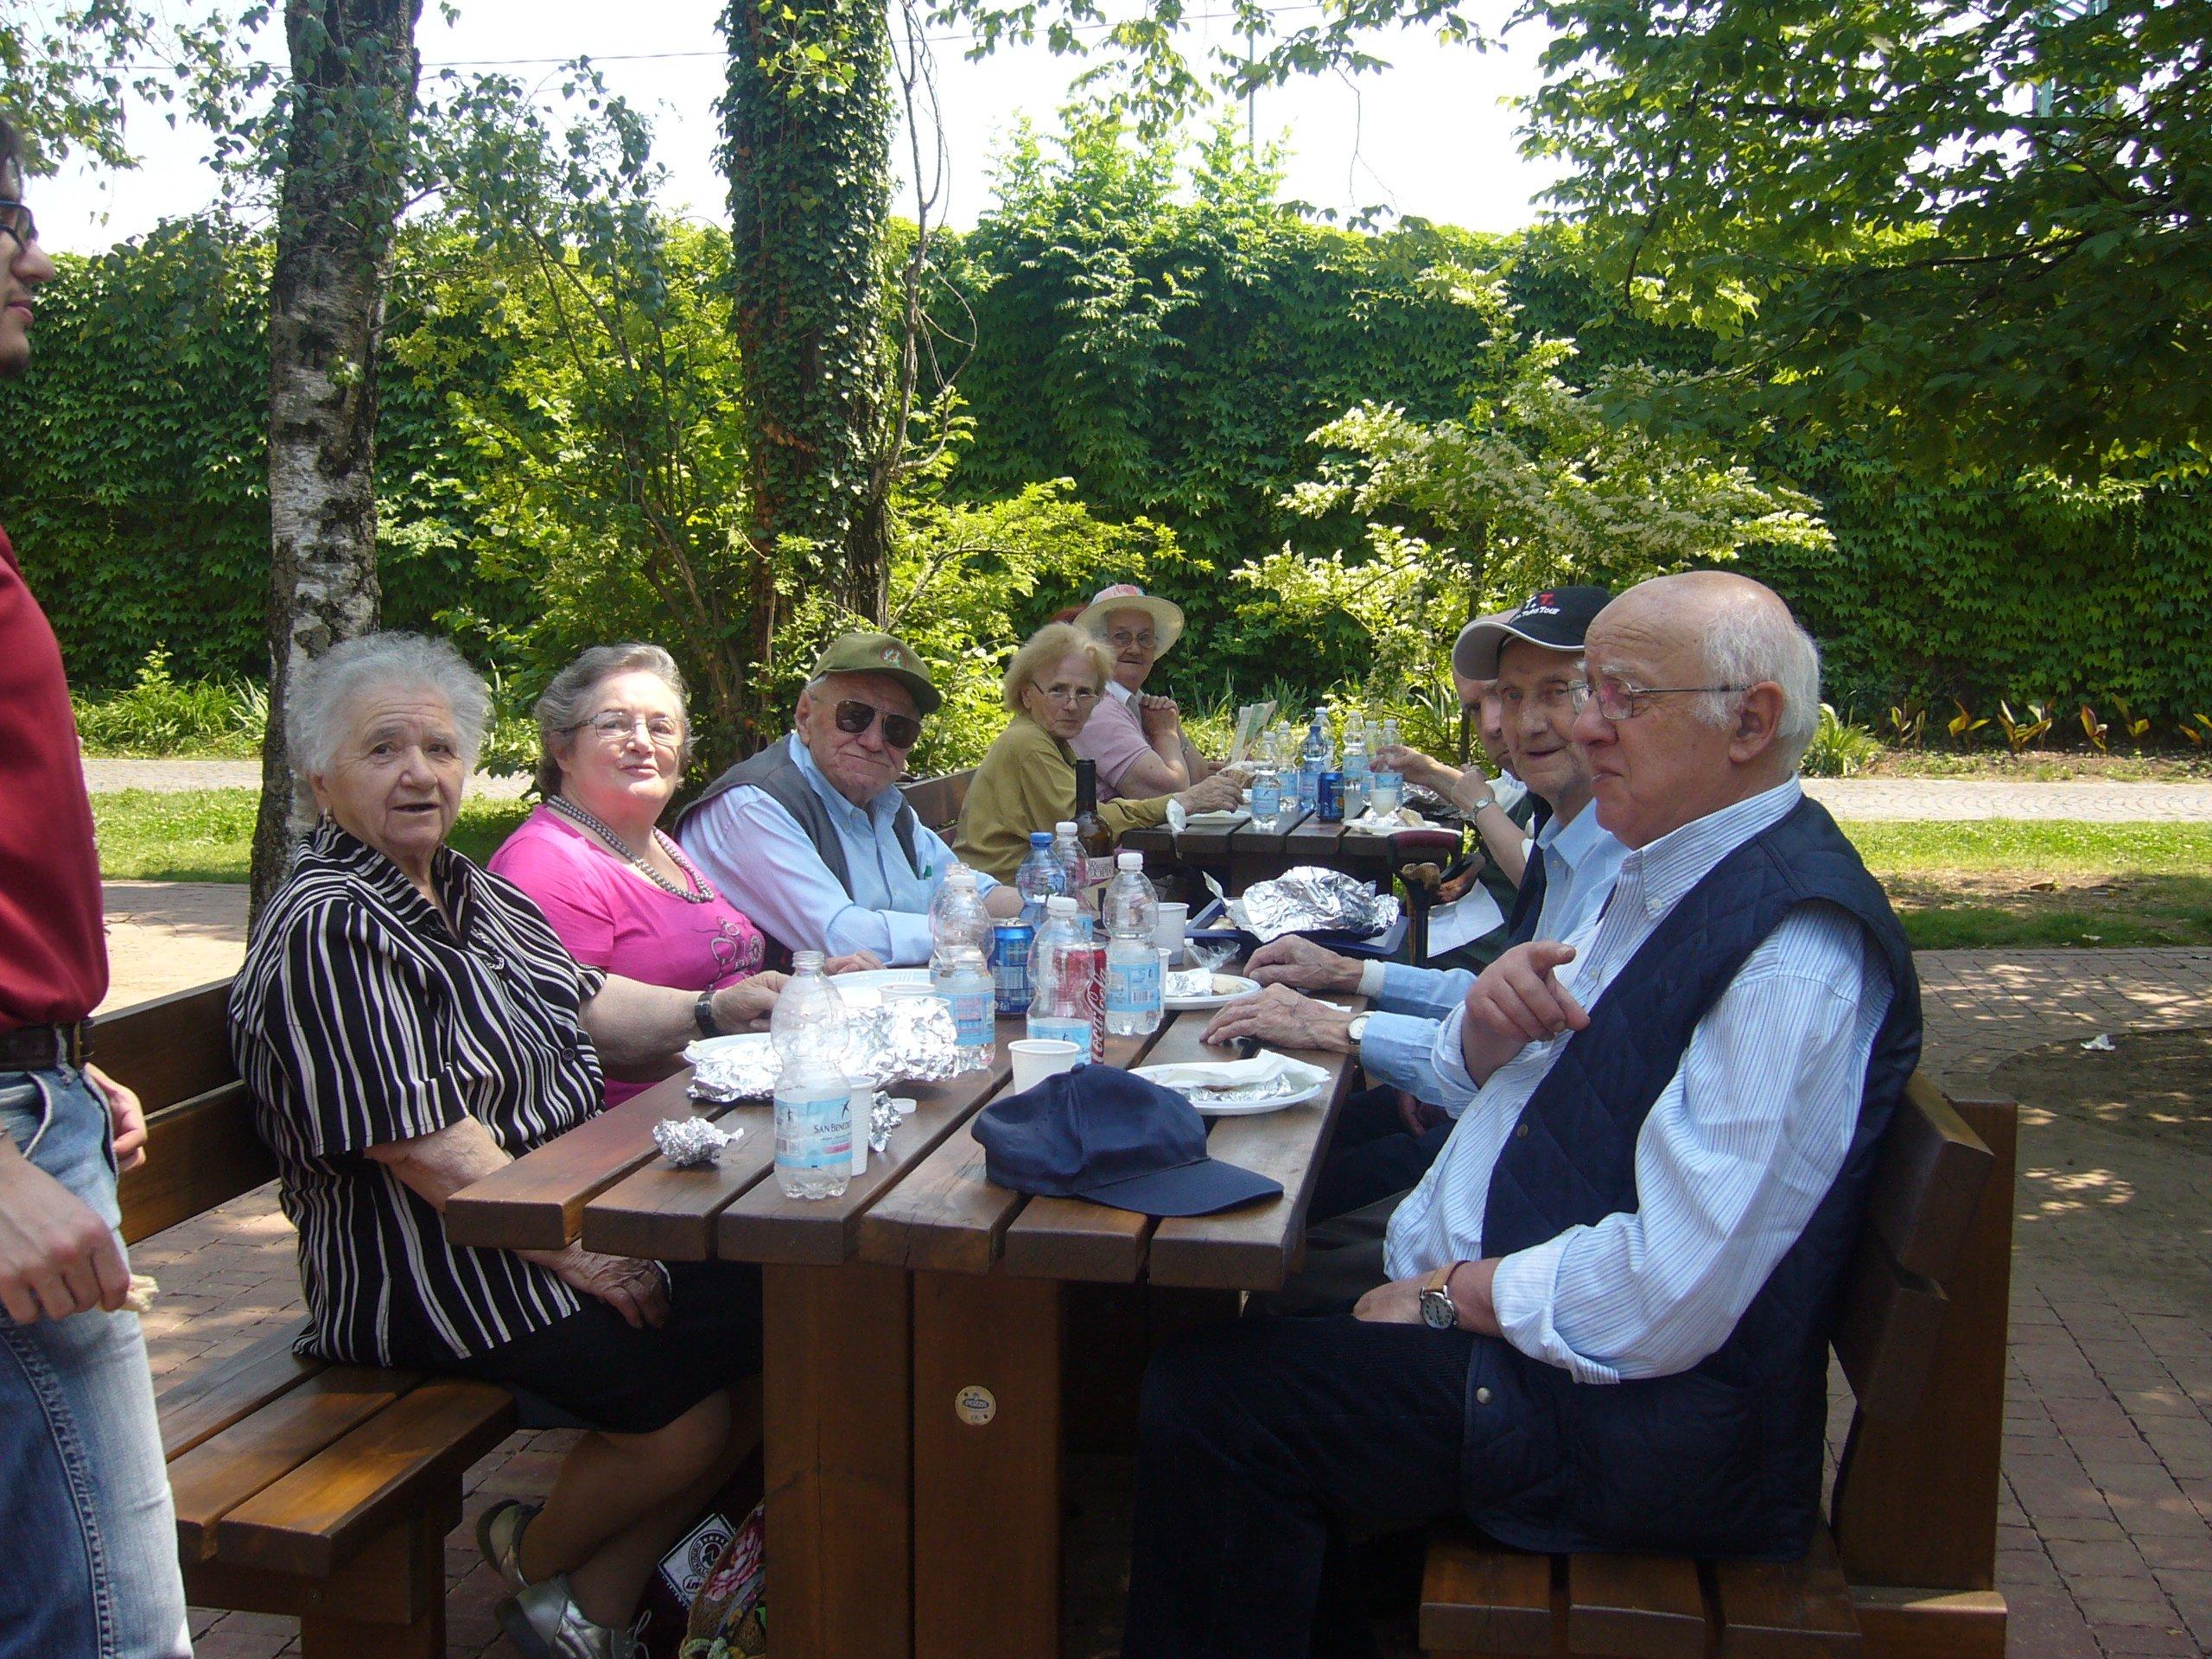 tavolata di anziani in pic-nic